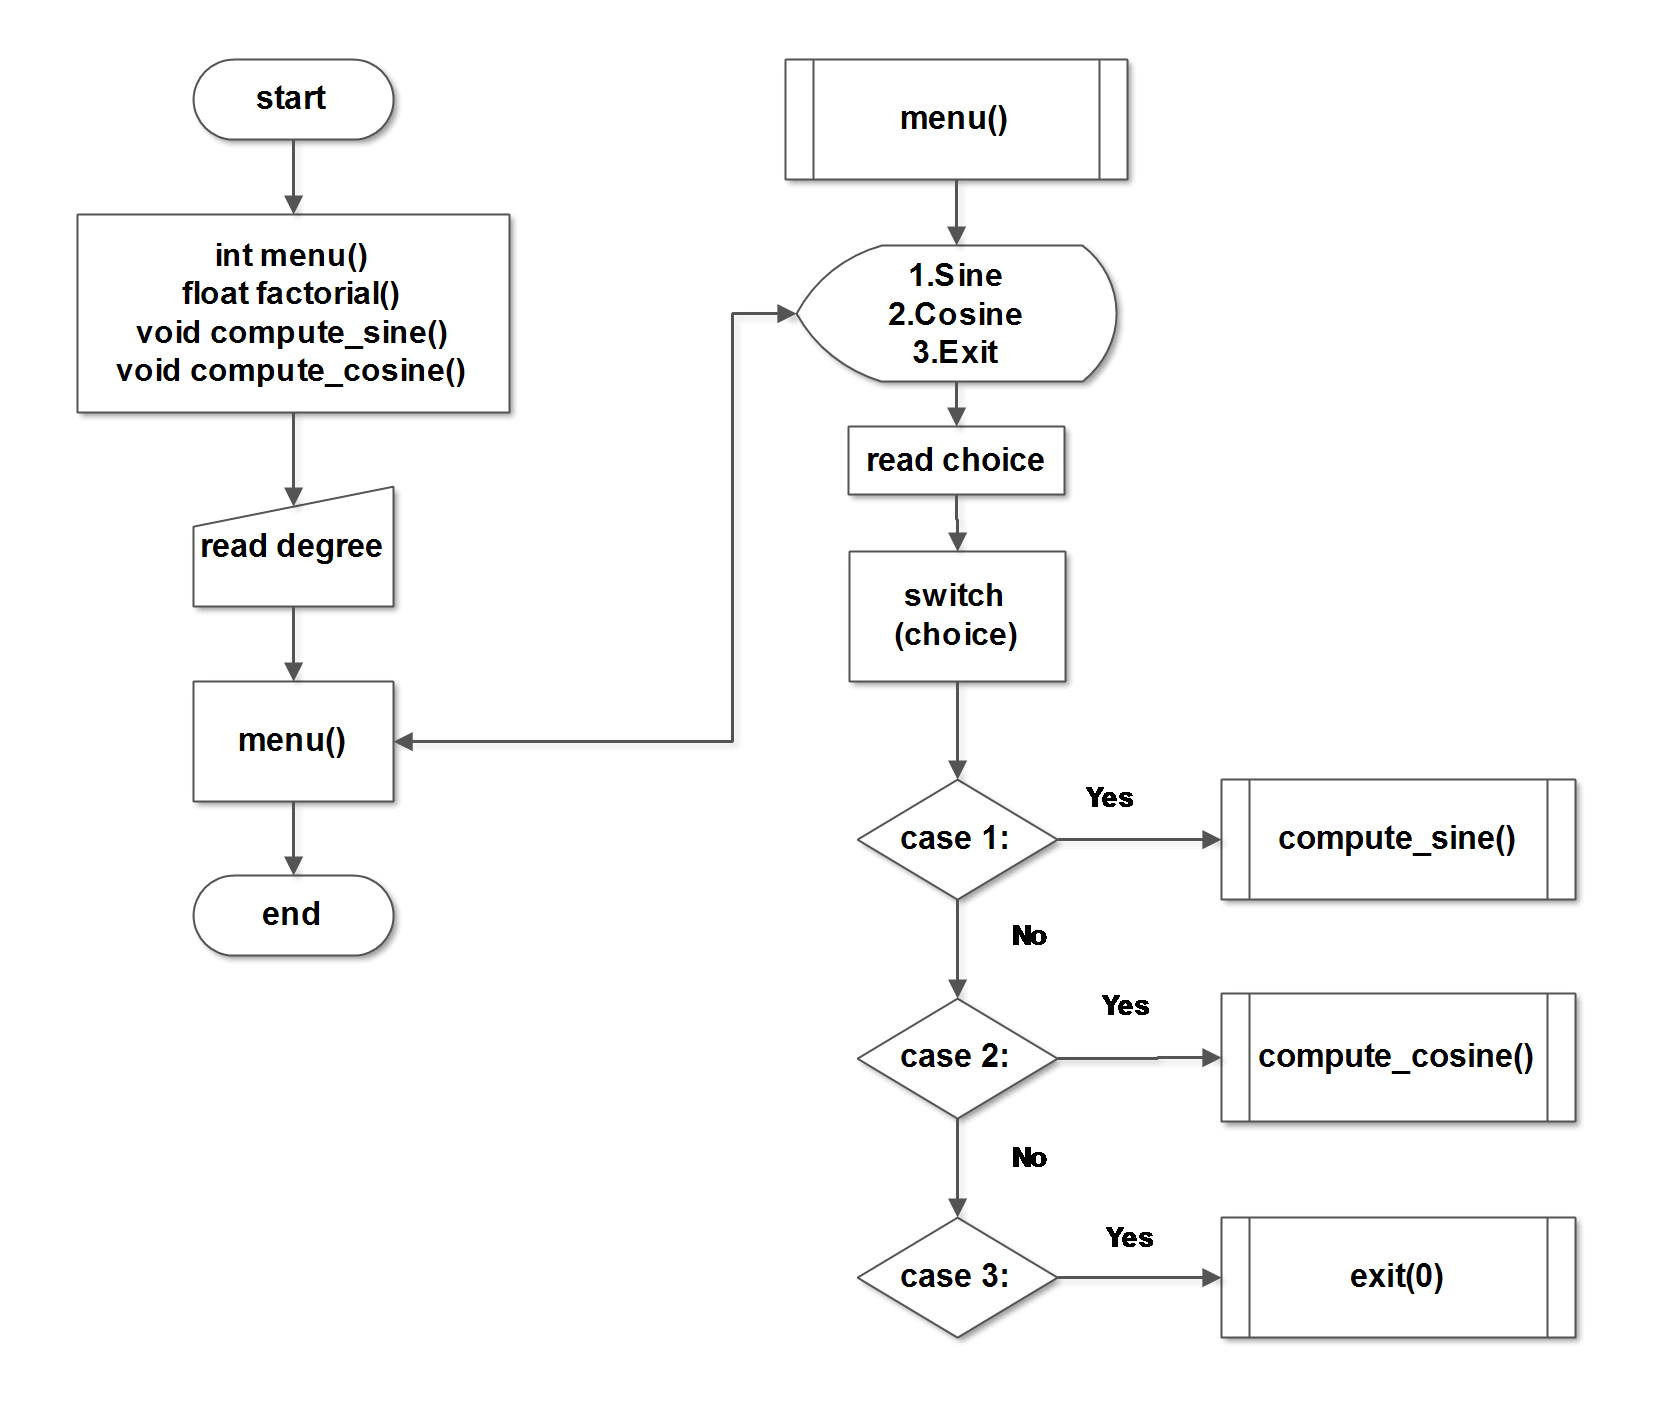 Flowchart-Sine and Cosine Series